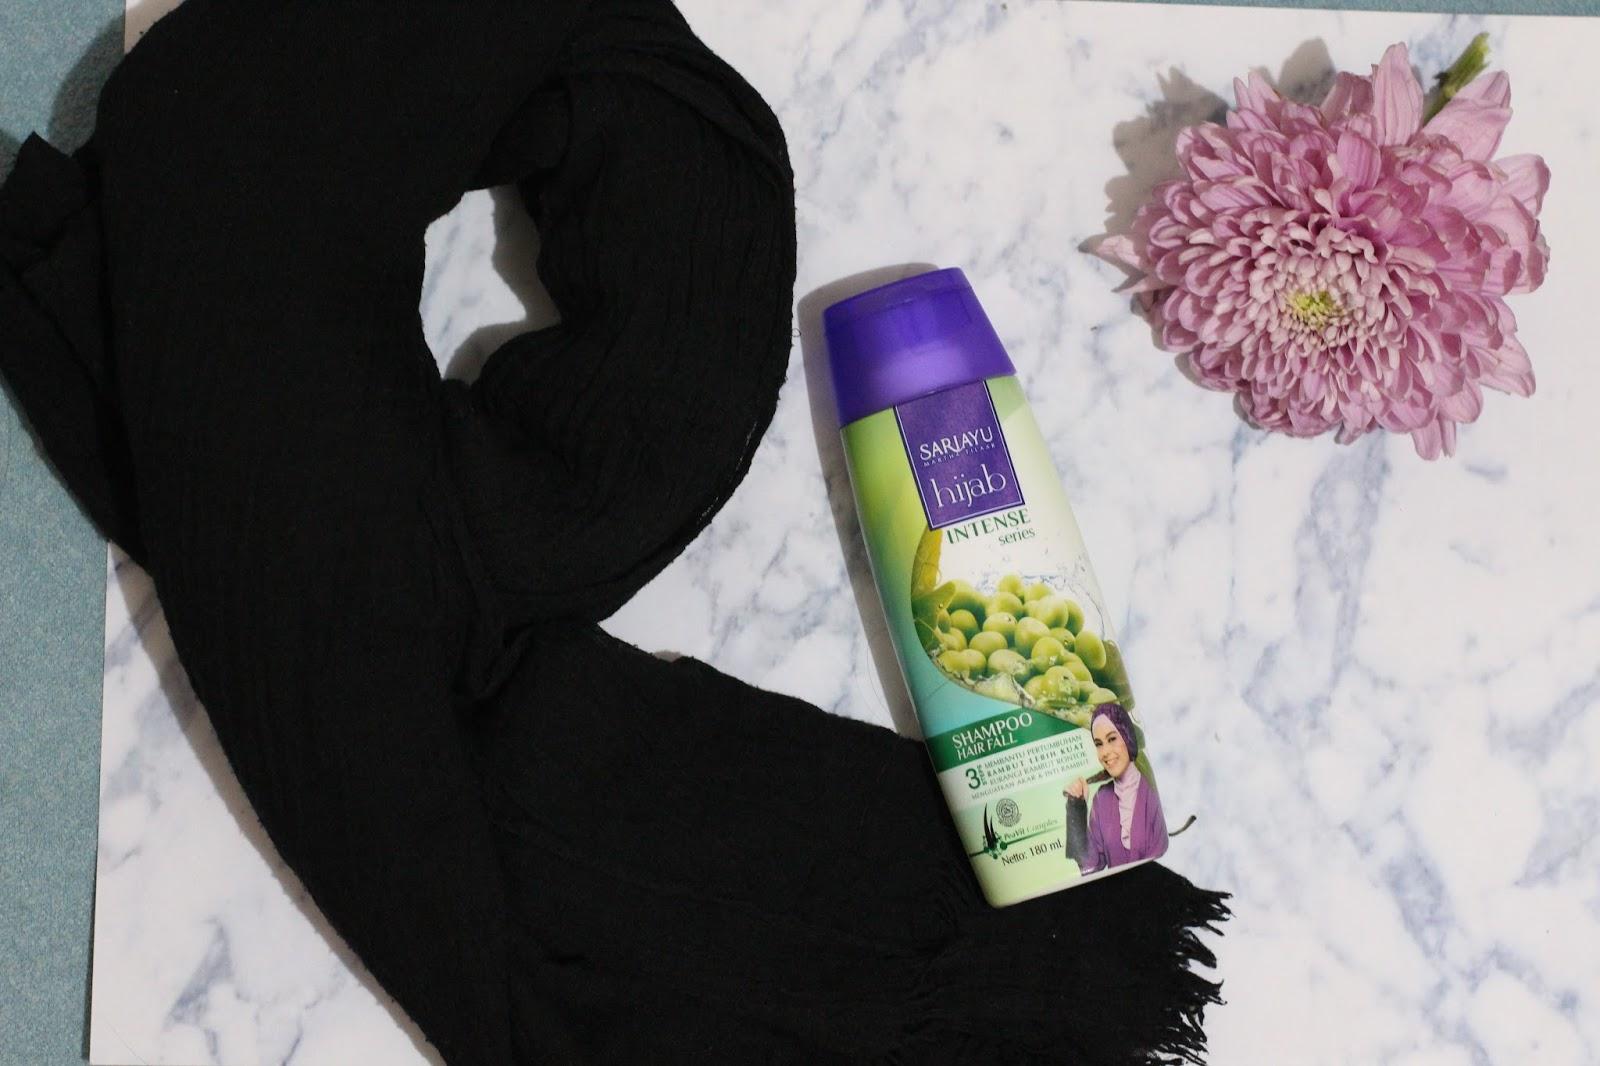 Review Sariayu Hijab Hairfall Arifa Nuryani Sari Ayu Shampoo Hair Fall 180ml Waktunya Product Nya